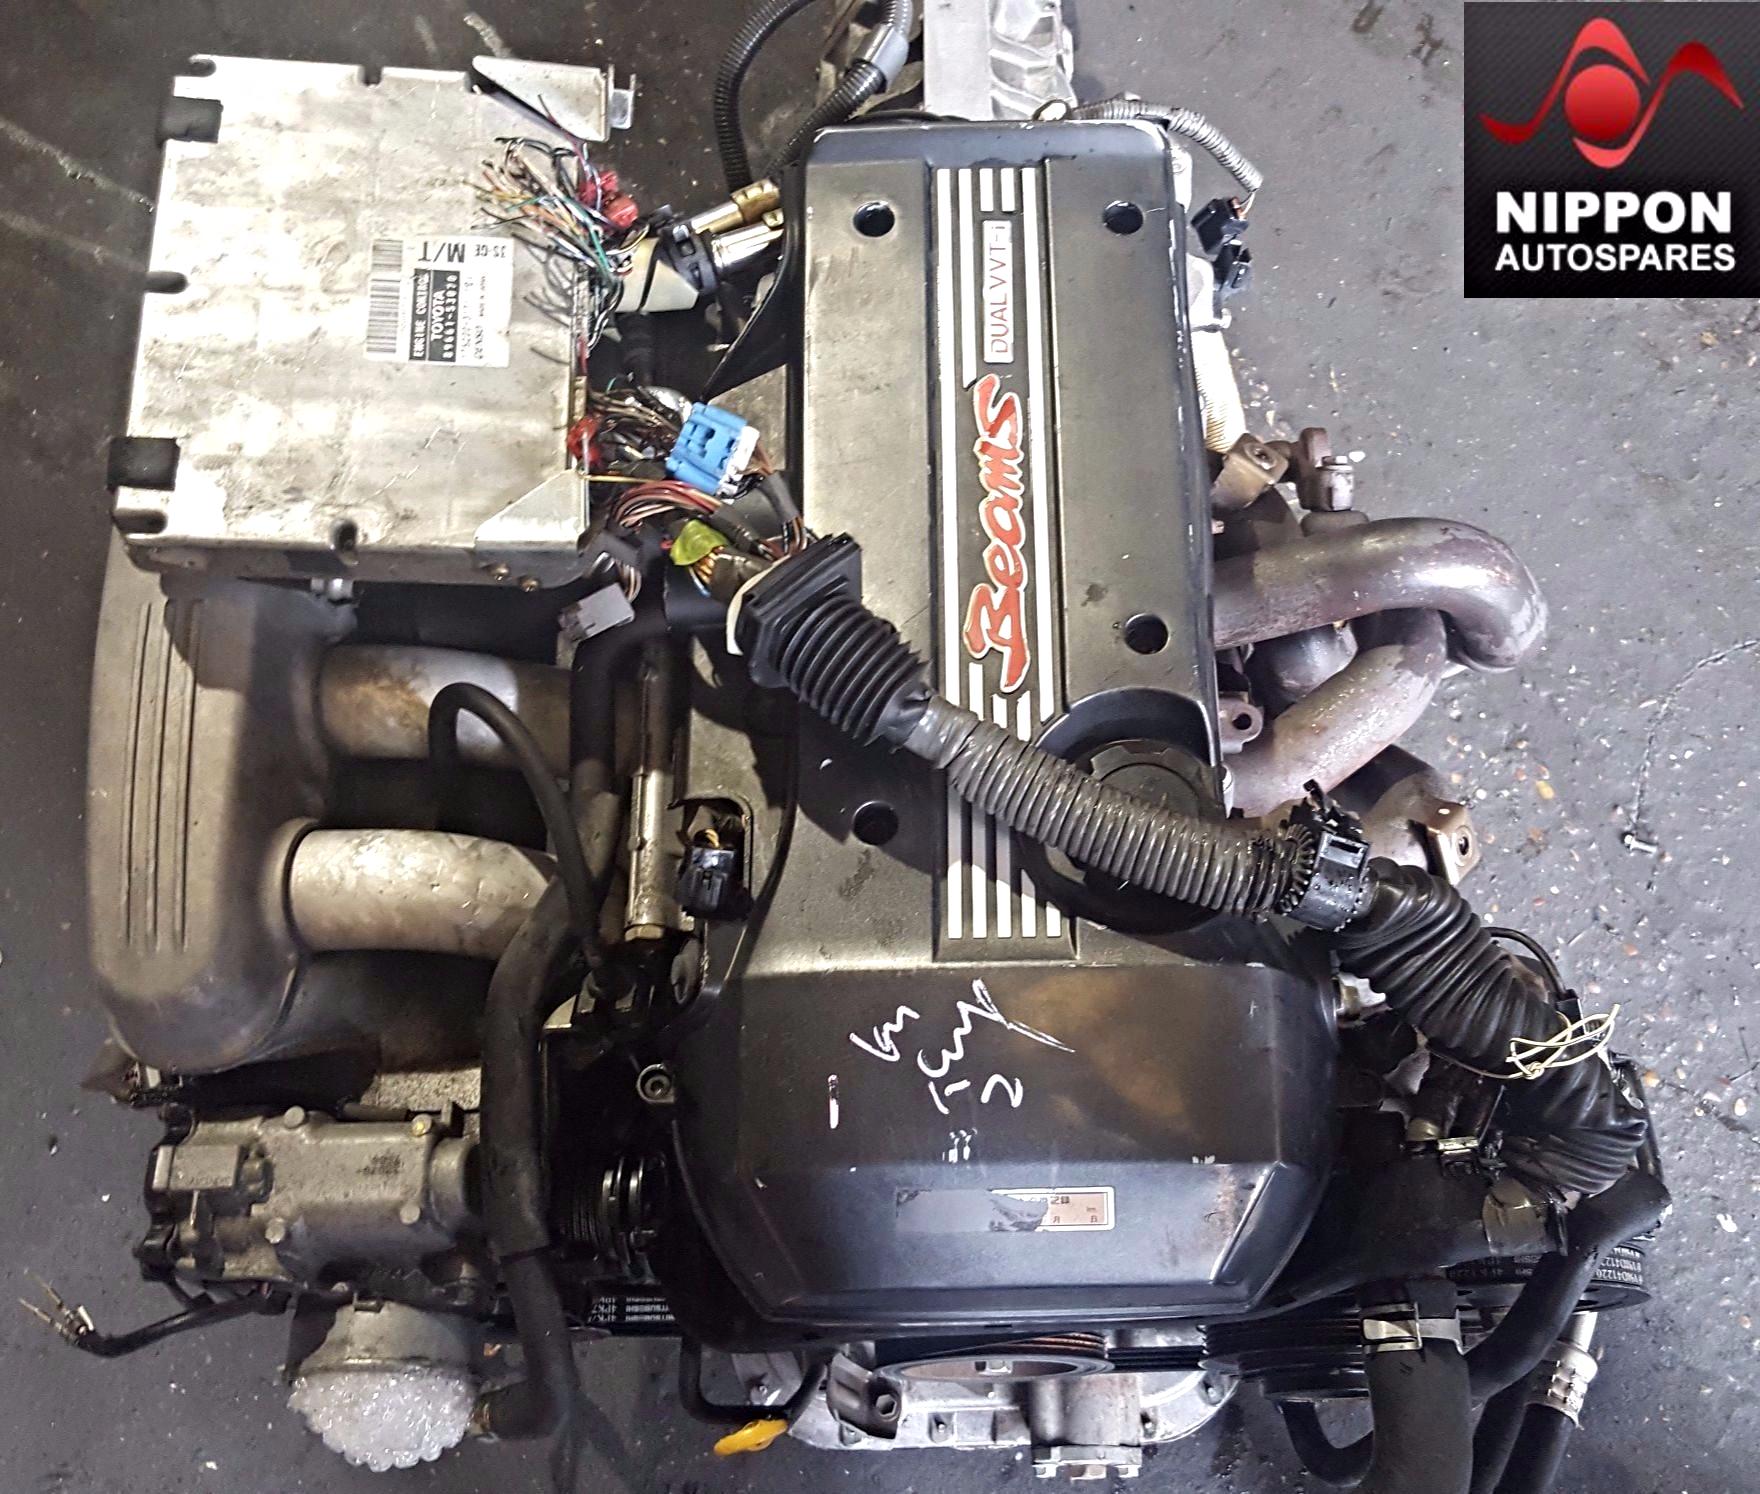 toyota altezza rs200 3sge beams engine kit manual rh nipponautospares onlinestore com 3S-GE Engine Specs 3S-GE Horsepower